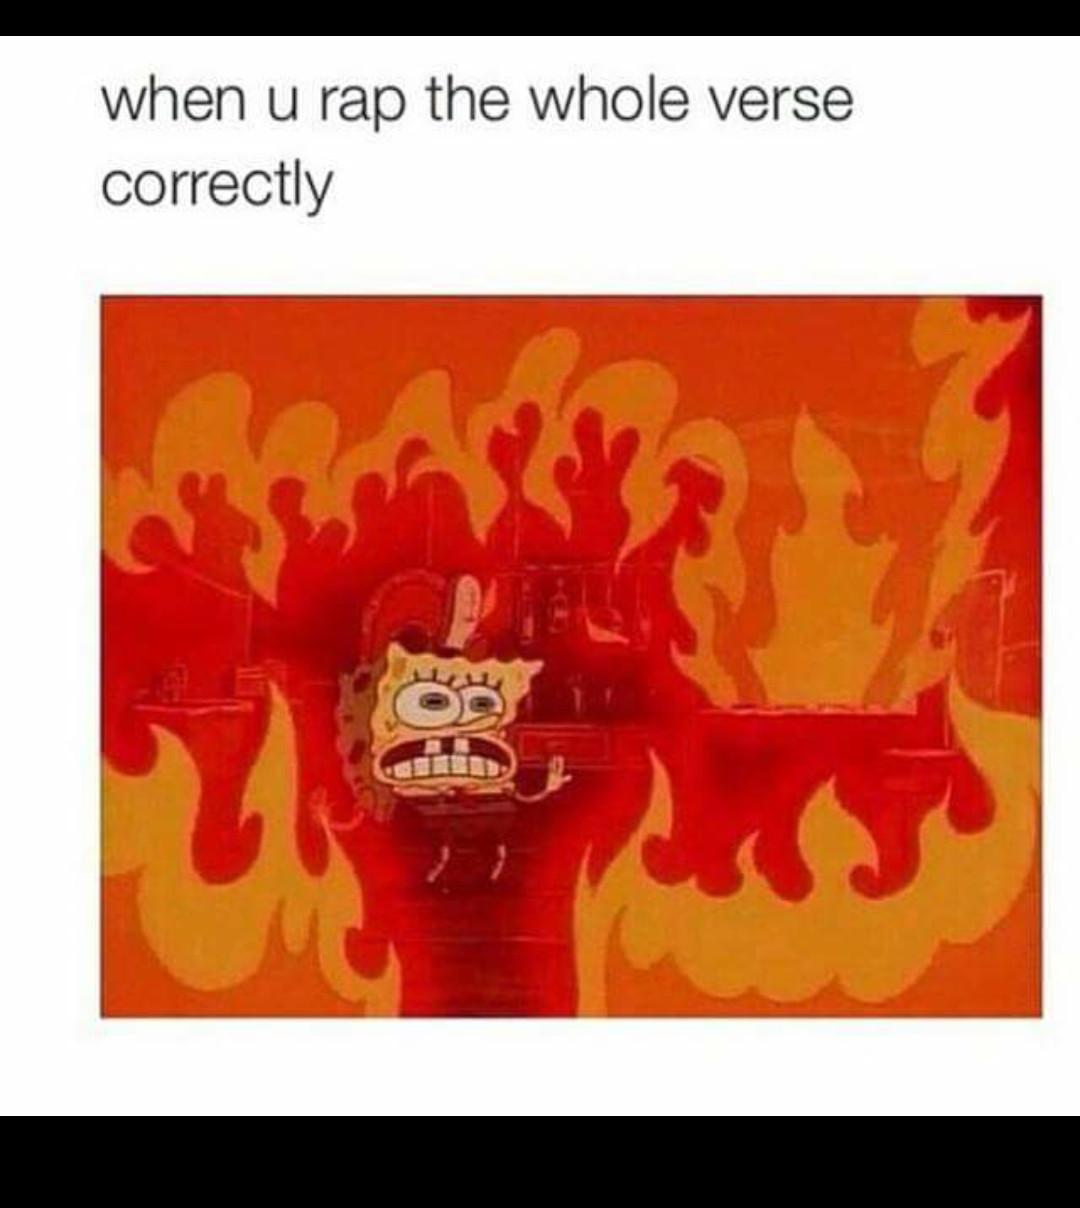 Rap game to stronk - meme